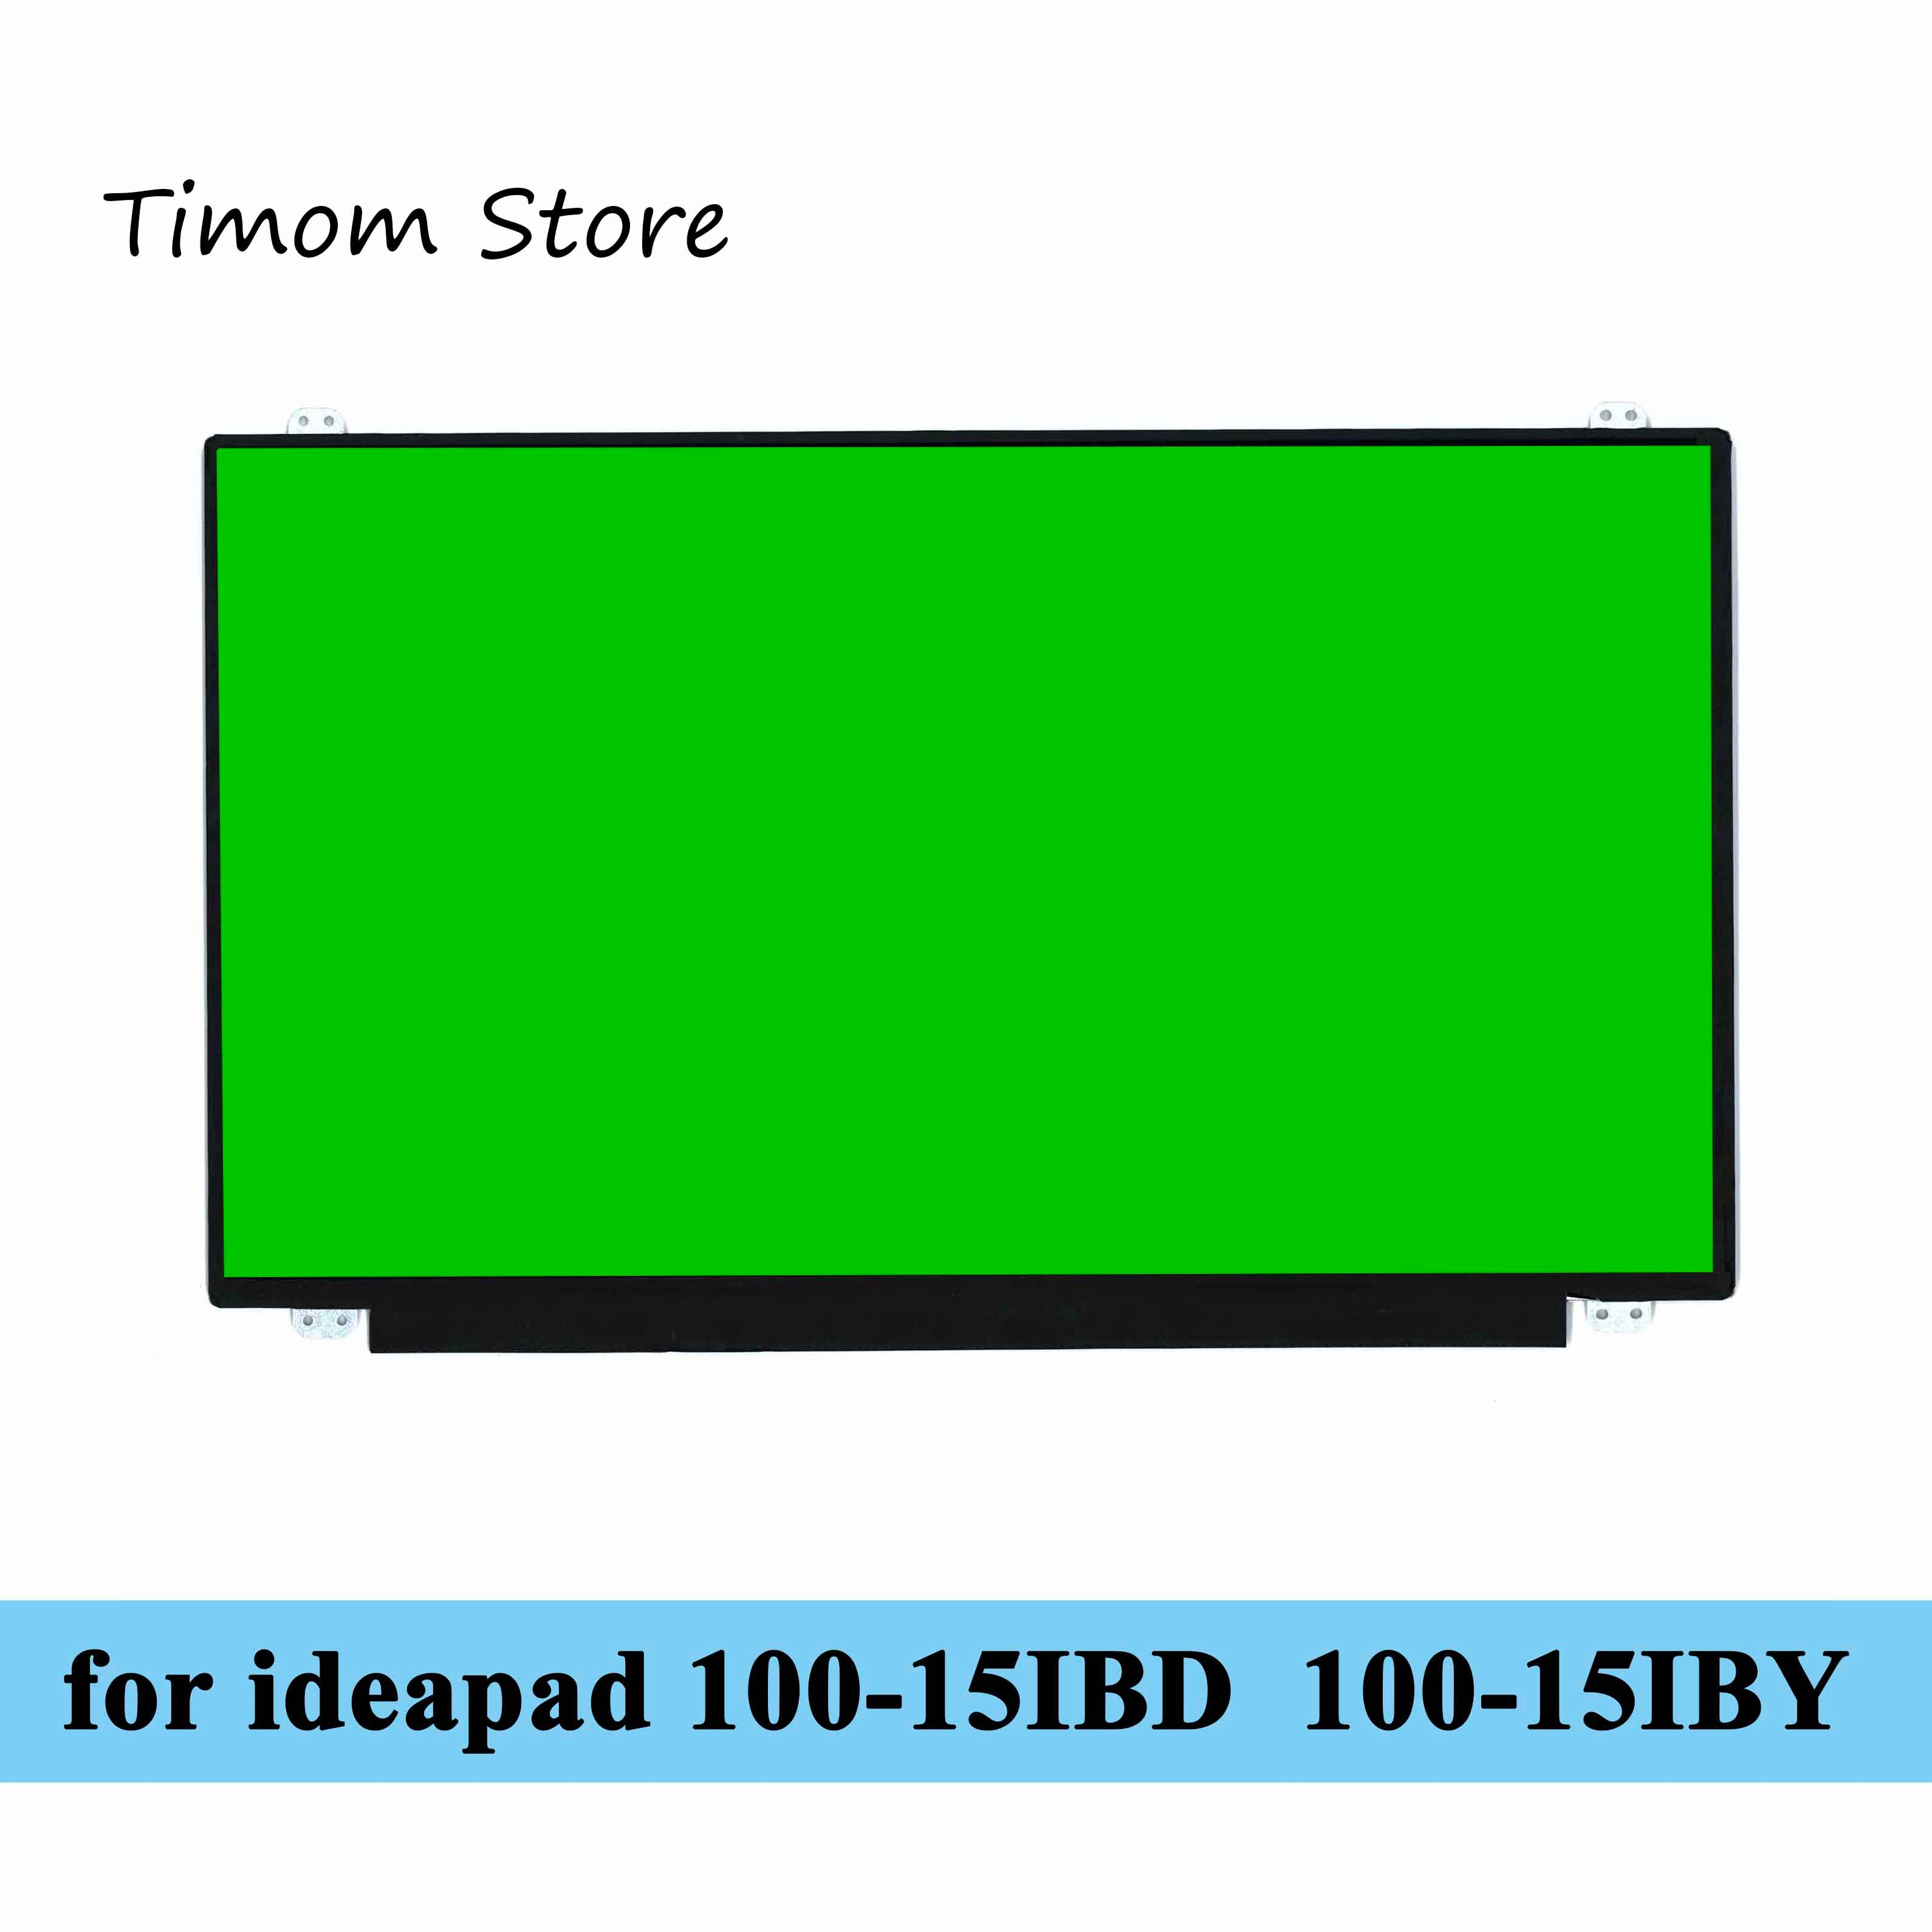 Tela de lcd para computador de notebook, para 100-15ibd 80qq-lenovo ideapad 100-15iby 80mj 80r8 20564 20644 hd 1366*768 led edp 30pin 15.6 matriz fina